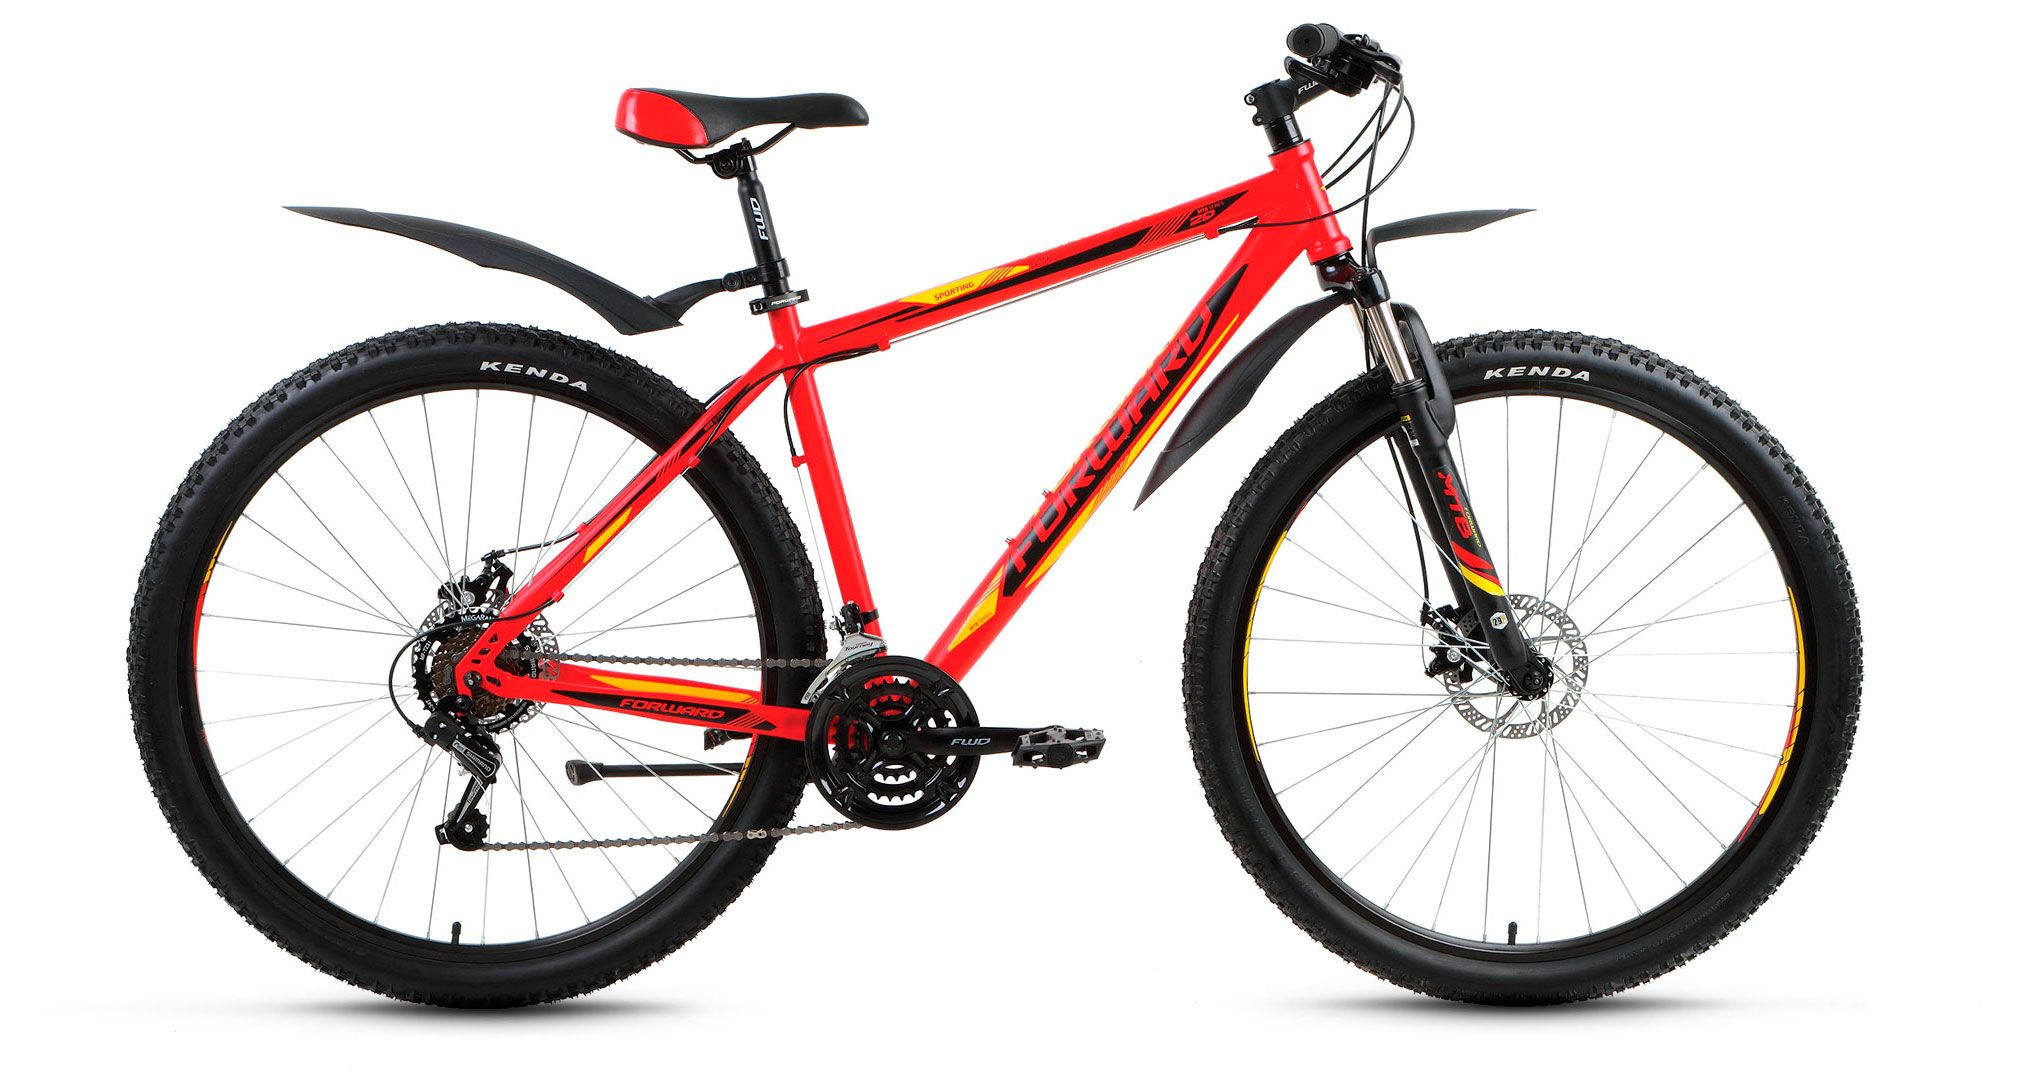 Велосипед Forward Sporting 2.0 29 disc 2018 велосипед forward sporting 2 0 29 disc 2018